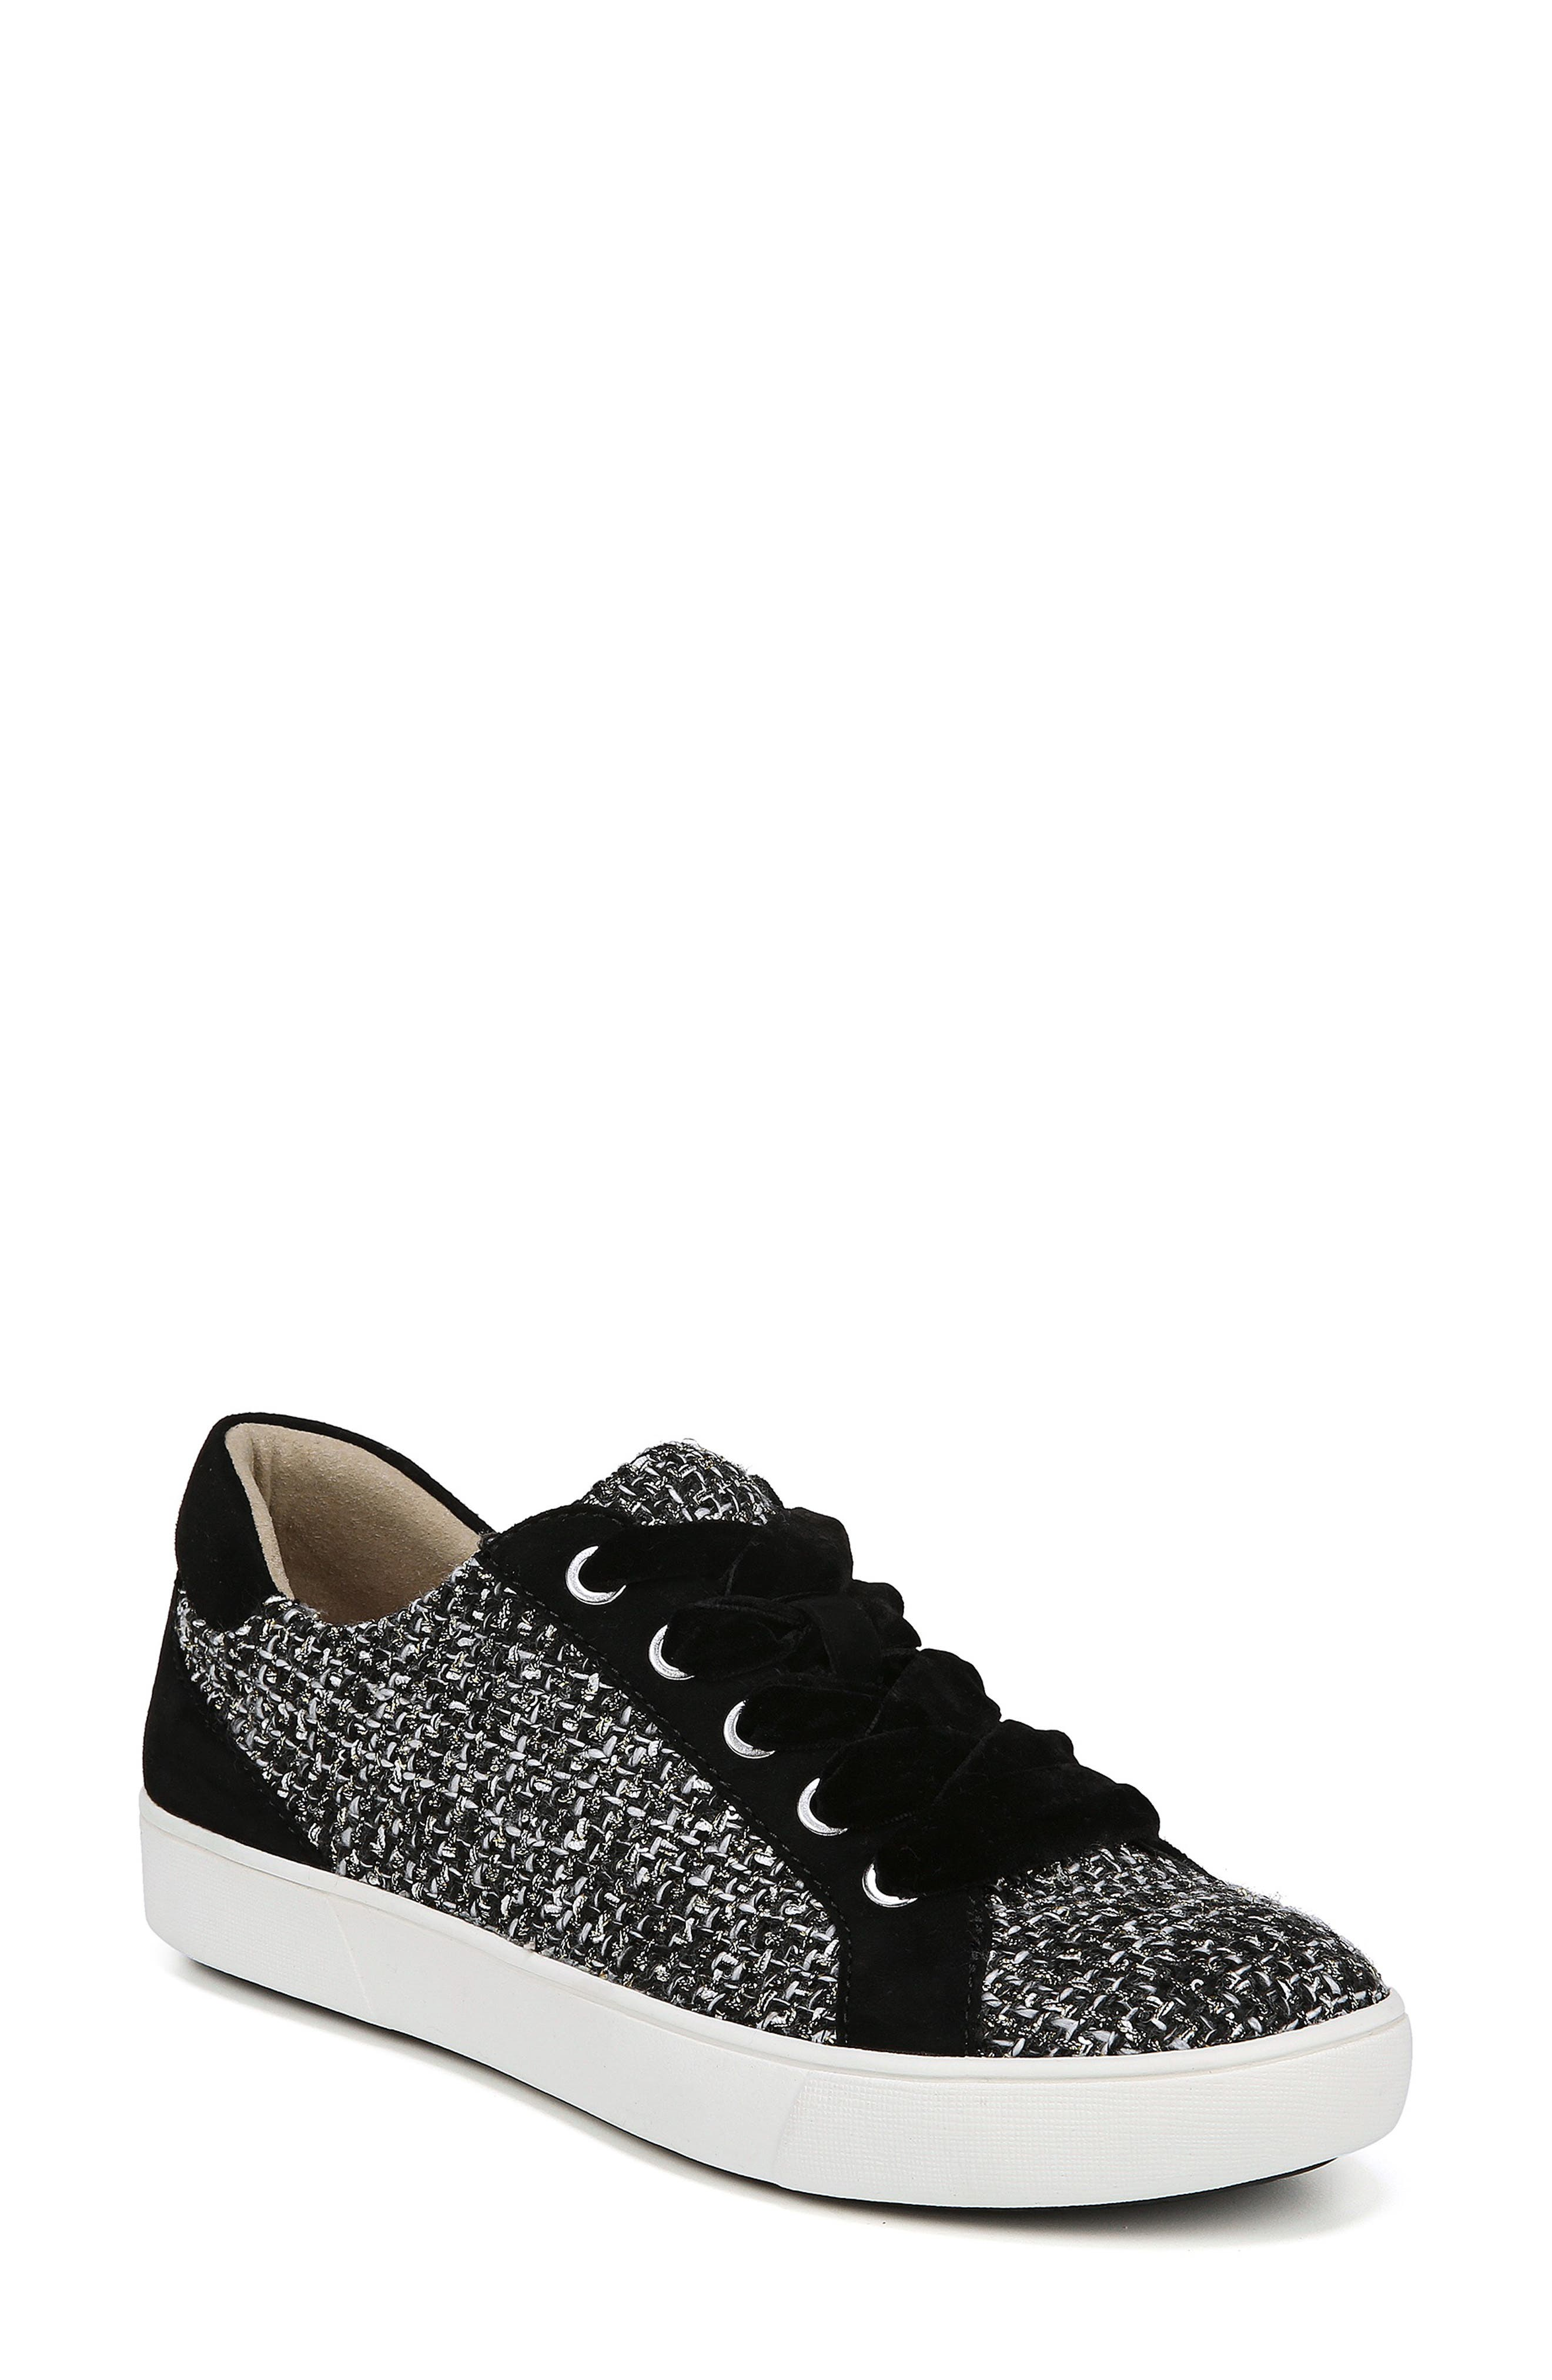 Morrison Sneaker,                             Main thumbnail 1, color,                             BLACK/ WHITE TWEED FABRIC